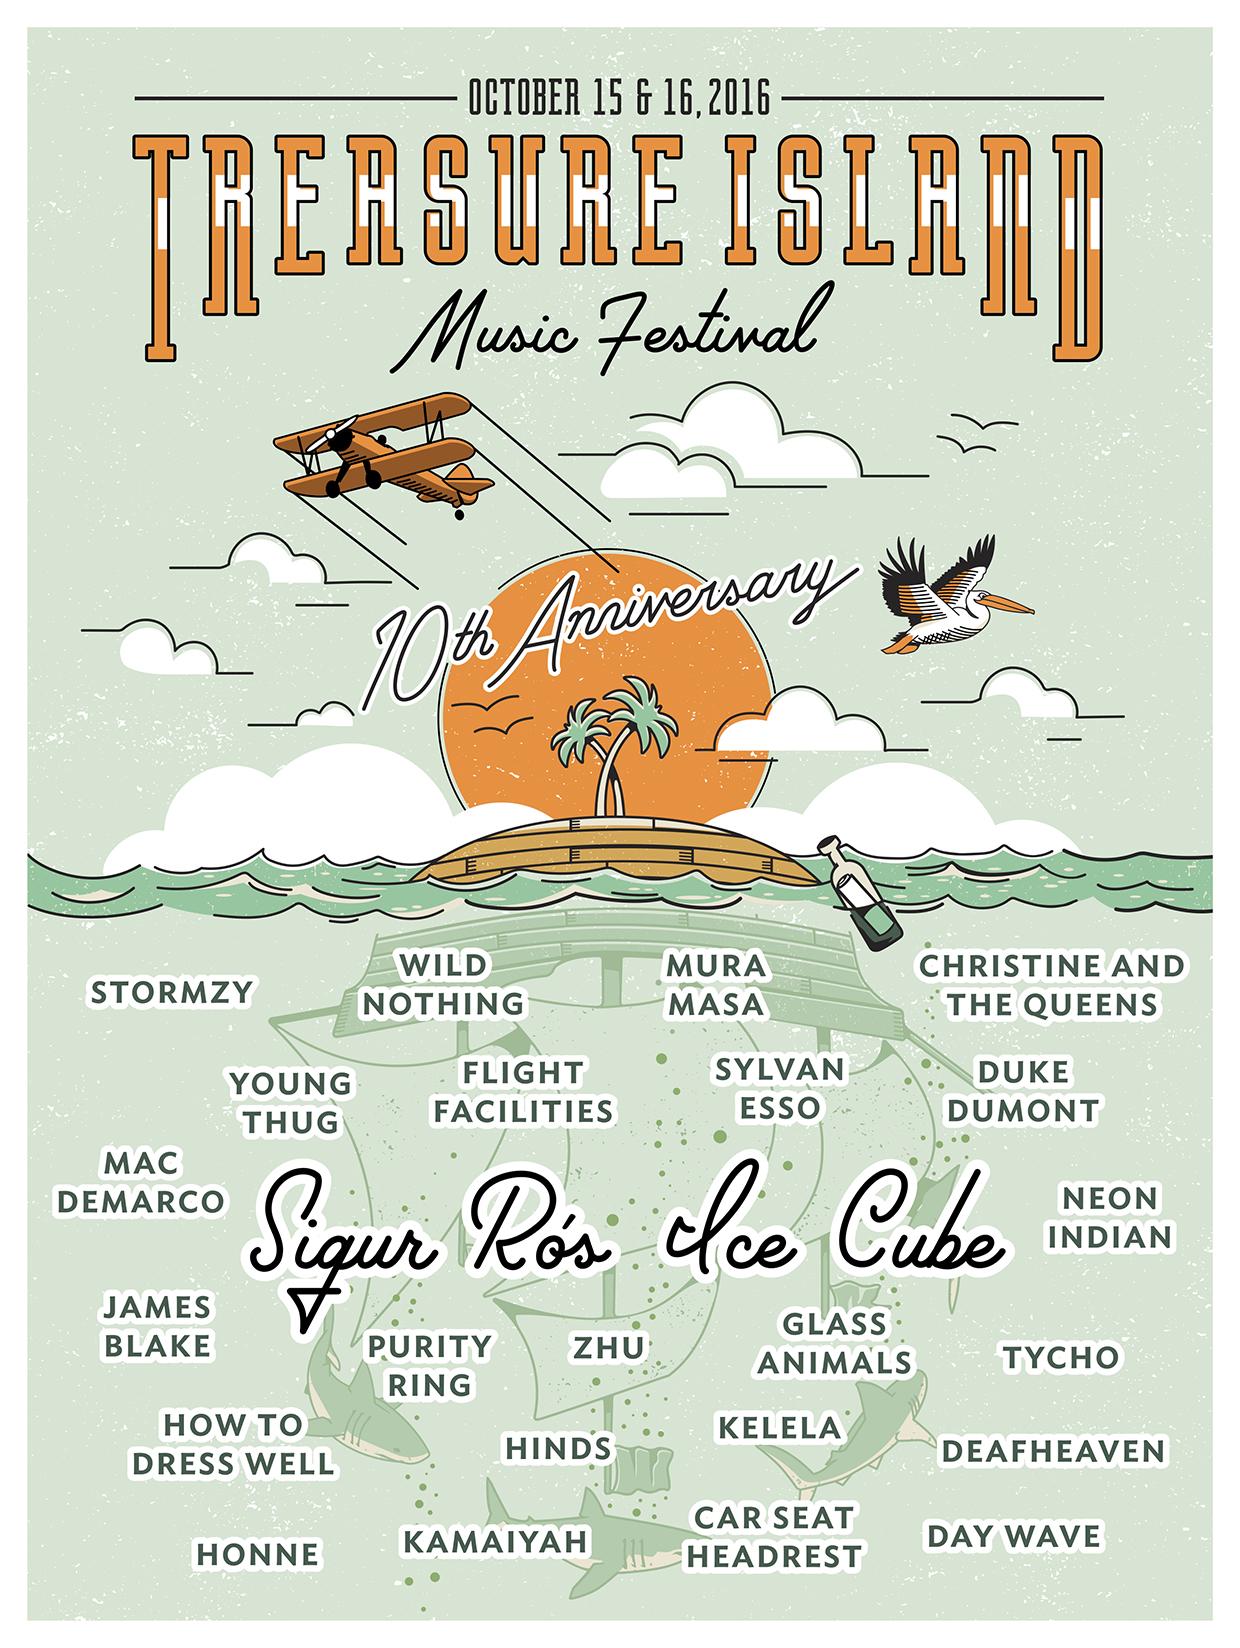 treasure-island-music-festival-2016-poster-billboard-1240